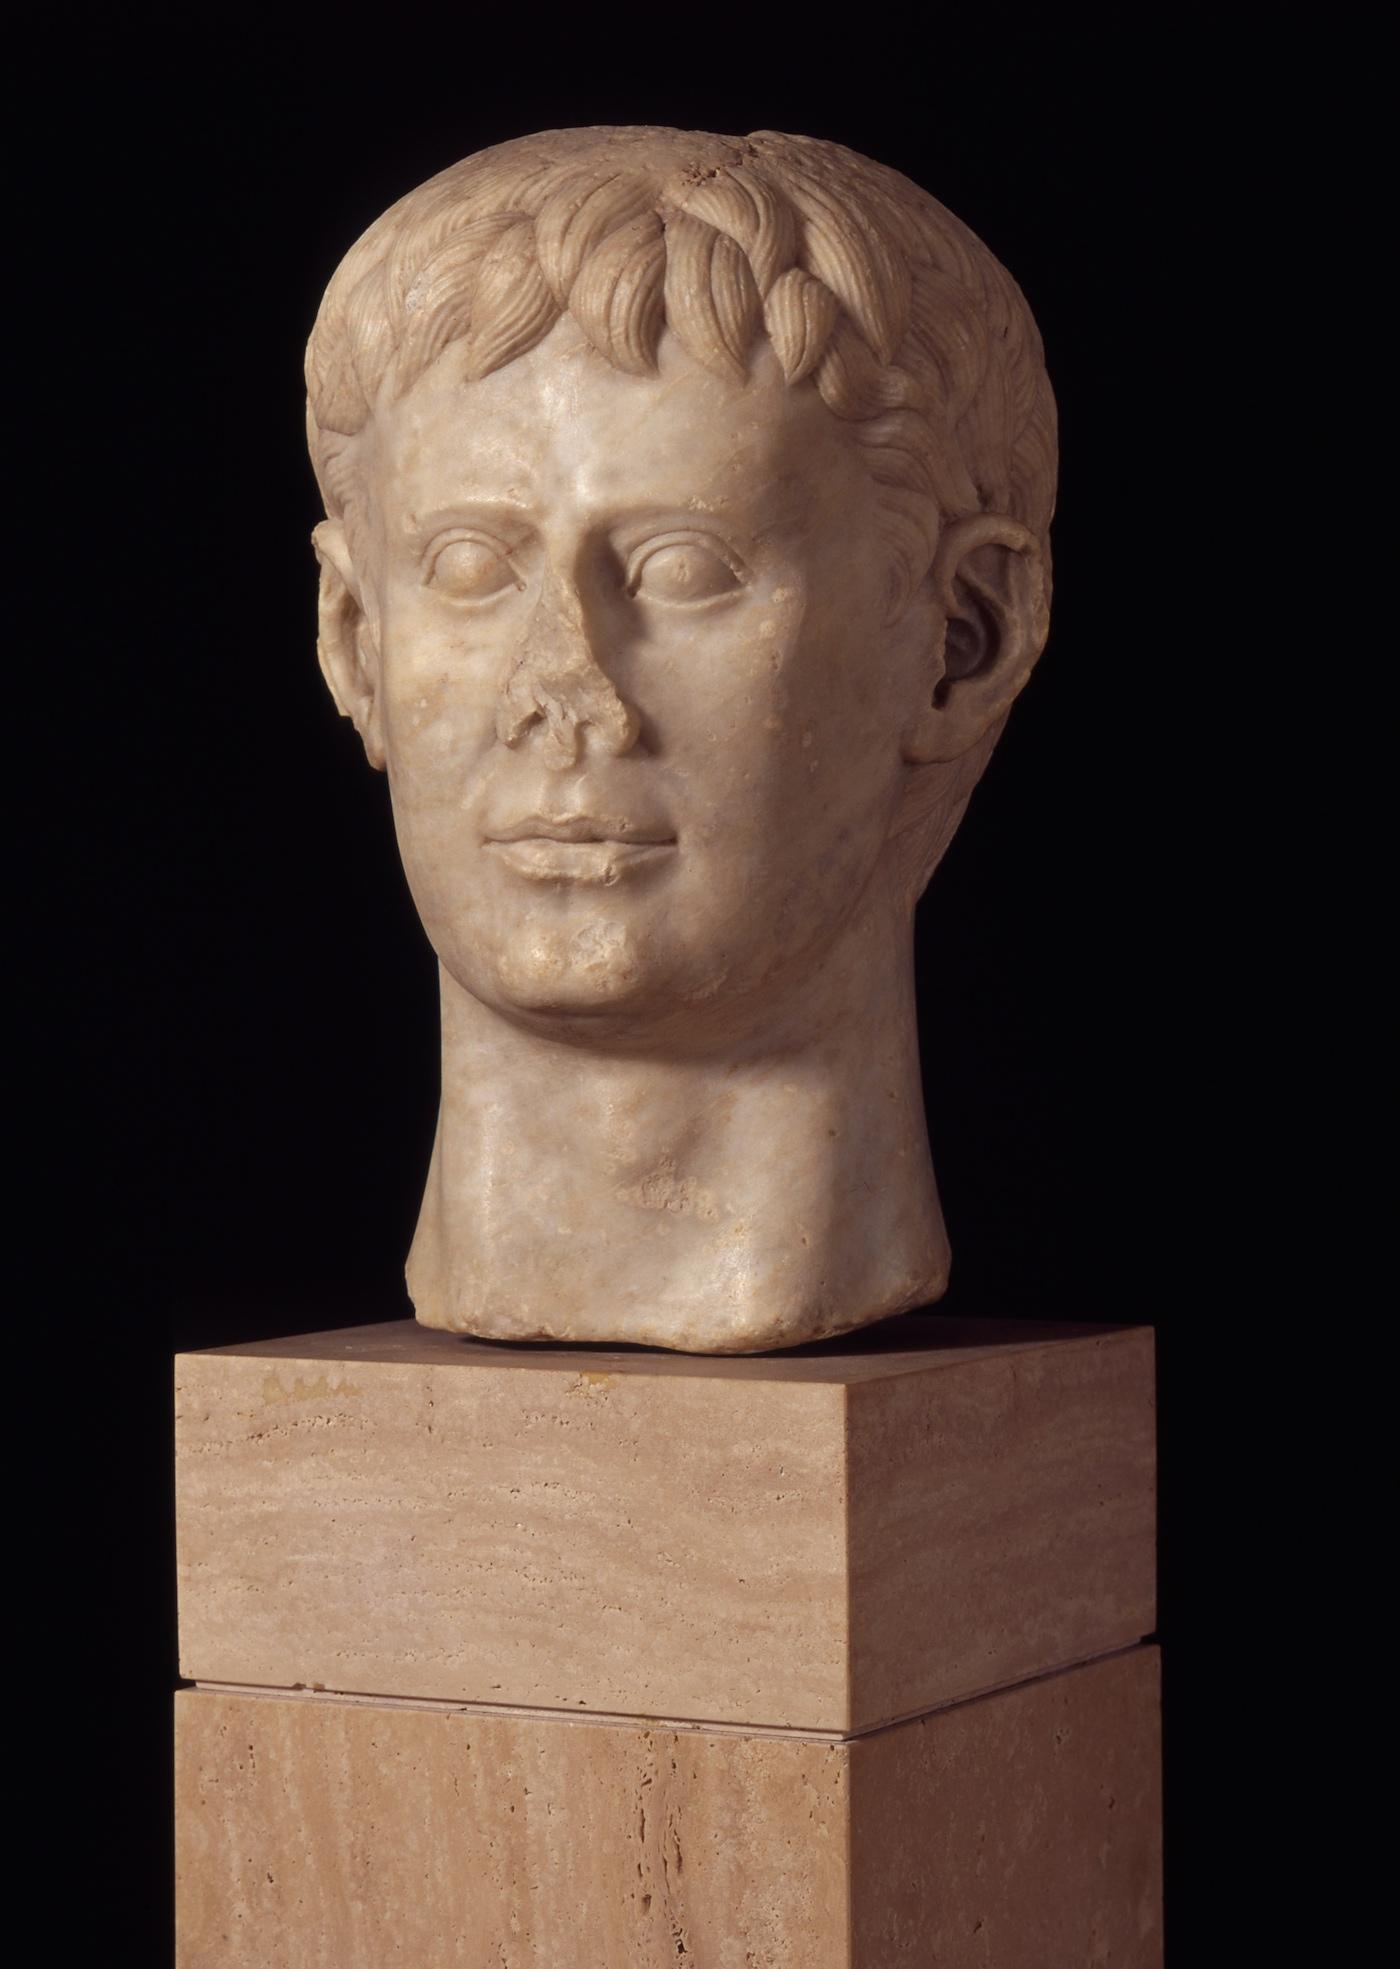 Marble bust of Frederick II, Italy (1220–50 CE) (Deutsches Archäologisches Institut, Rome; © H. Behrens, DAI Rom)